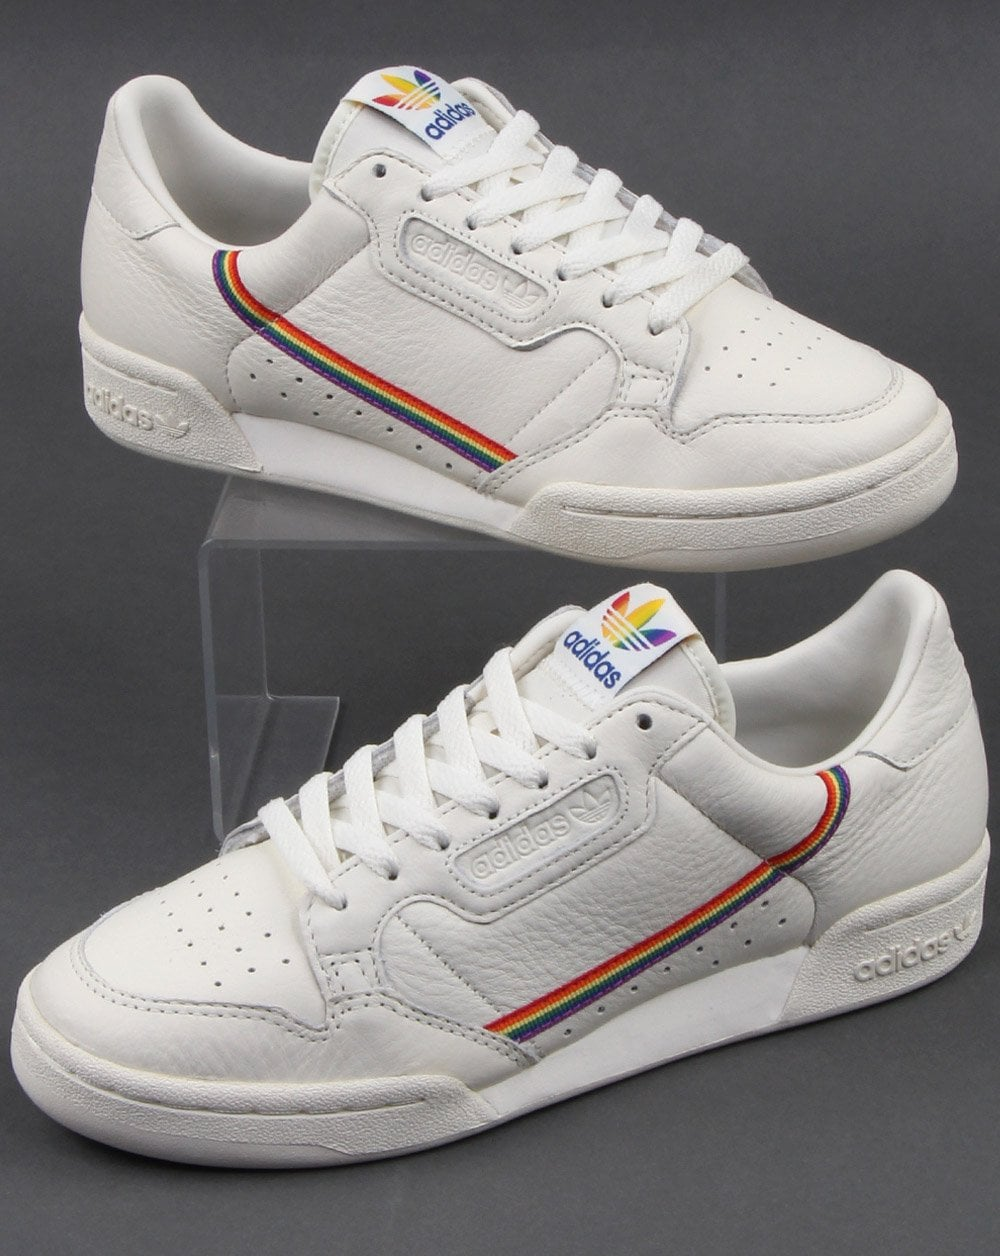 Adidas Continental 80s Pride Trainers White- Multi